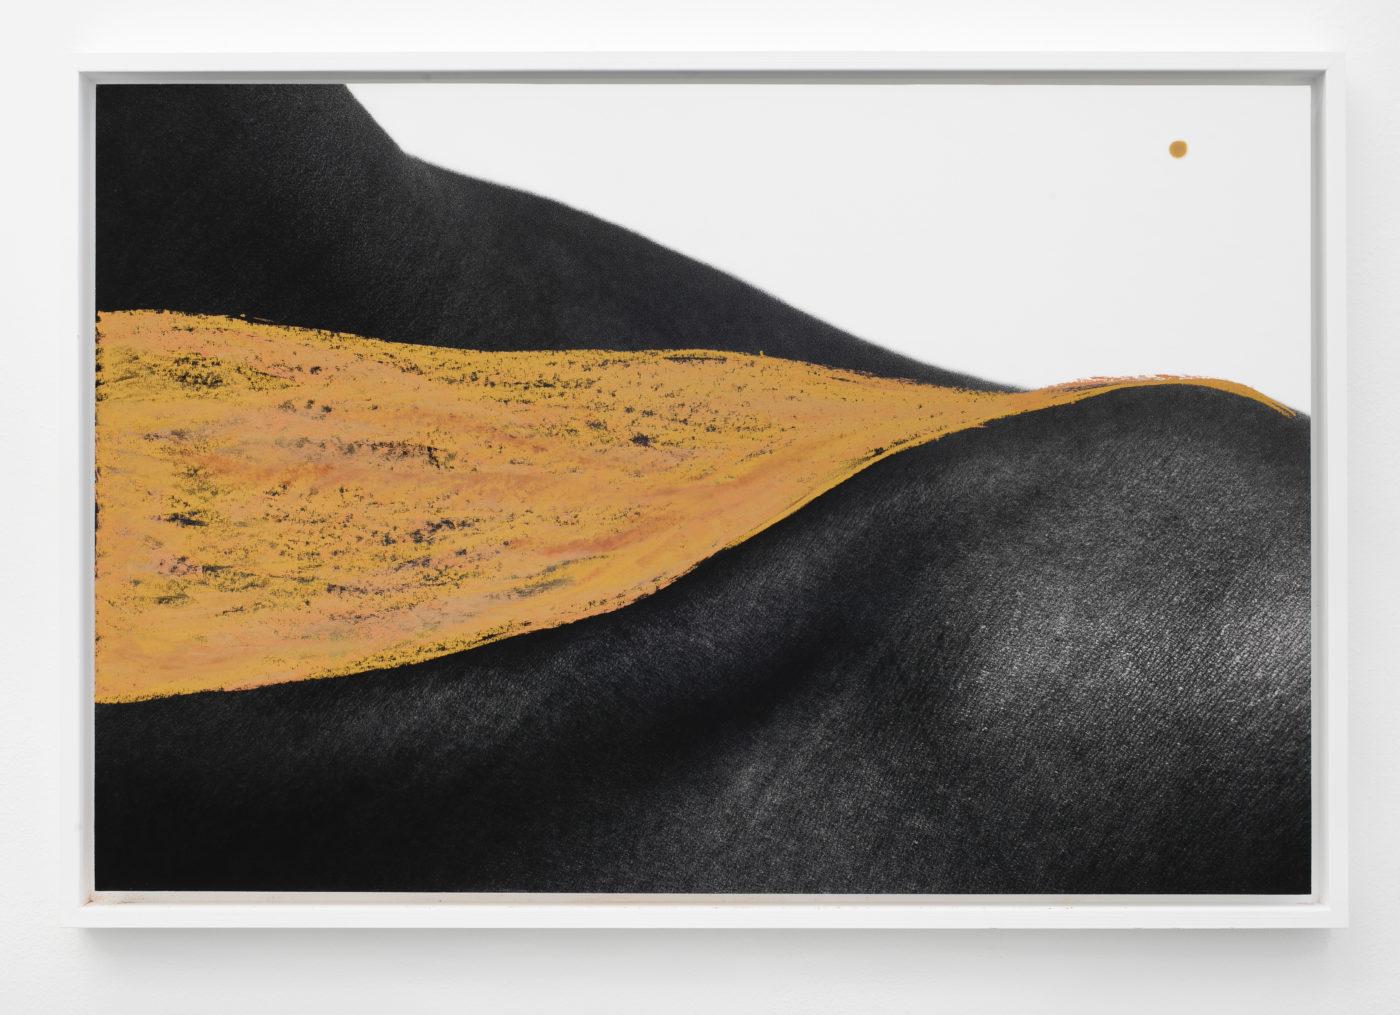 "Binta Diaw, Chorus of Soil, 2020, installation view of the exhibition ""In Search of Our Ancestors' Gardens"", 23rd January-31st March 2020, Galleria Giampaolo Abbondio, Milan, courtesy the artist and Galleria Giampaolo Abbondio, photo-credits: Antonio Maniscalc"